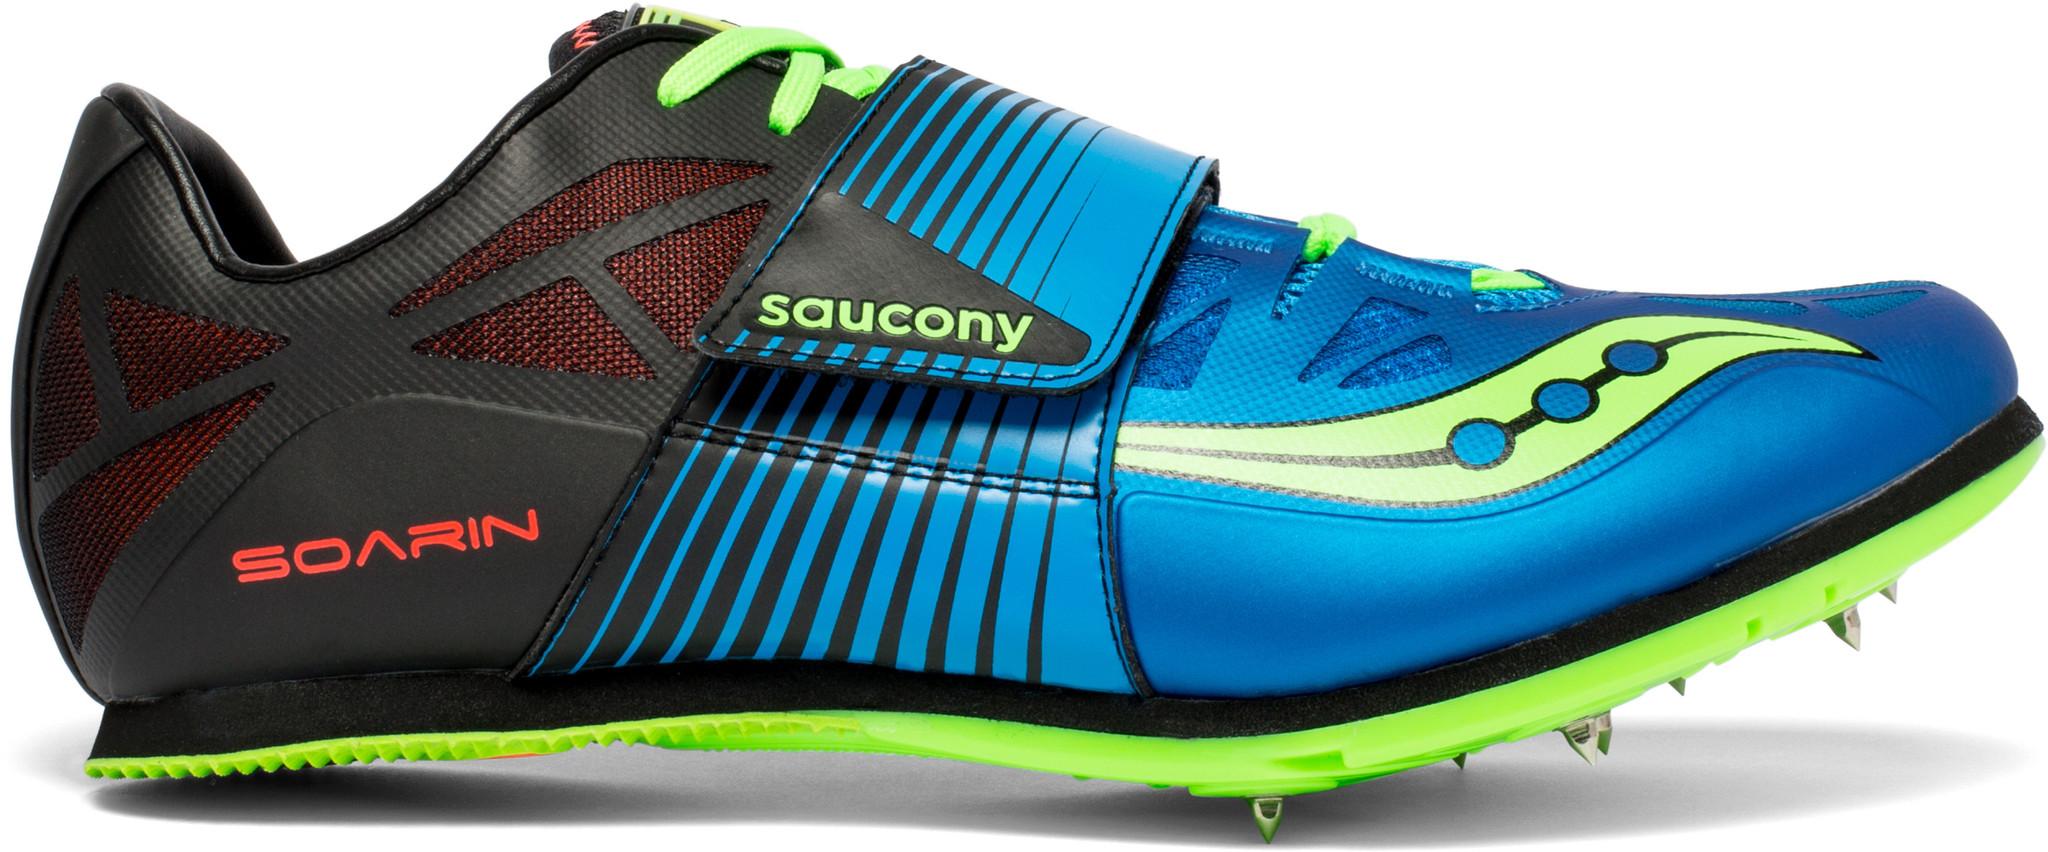 buy \u003e saucony soarin j2, Up to 74% OFF